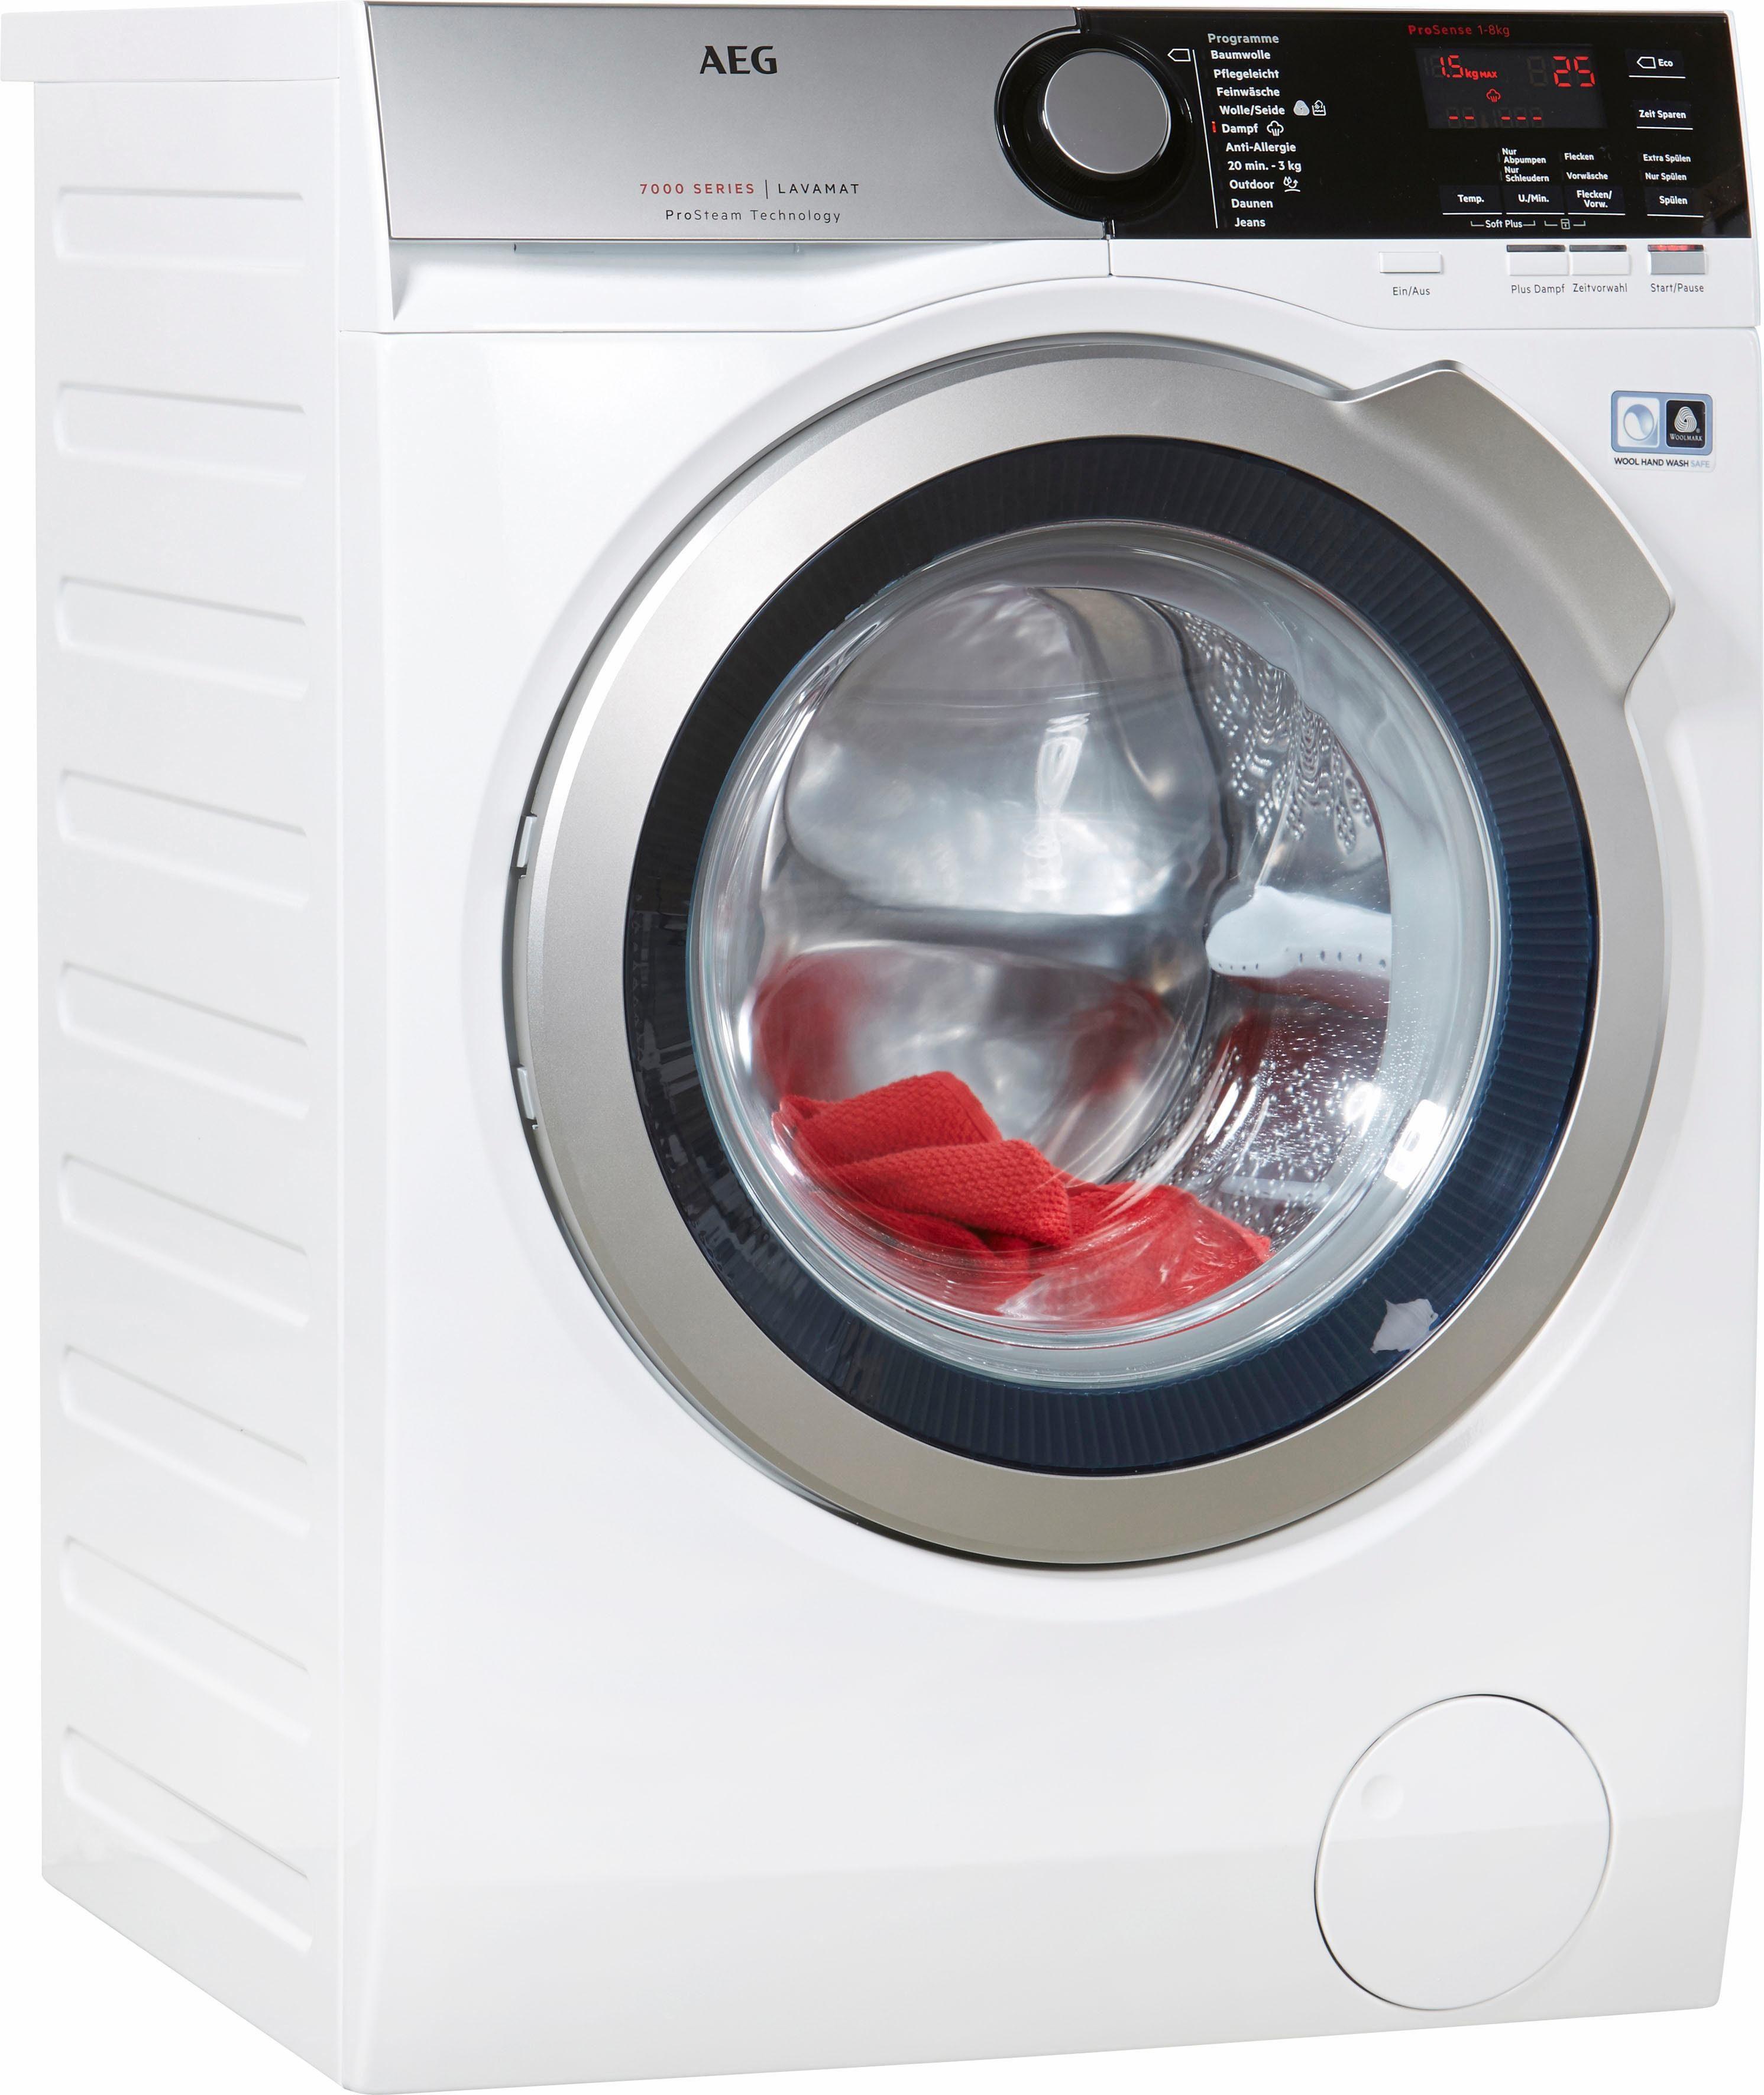 AEG Waschmaschine LAVAMAT L7FE76484, 8 kg, 1400 U/Min, ProSense®